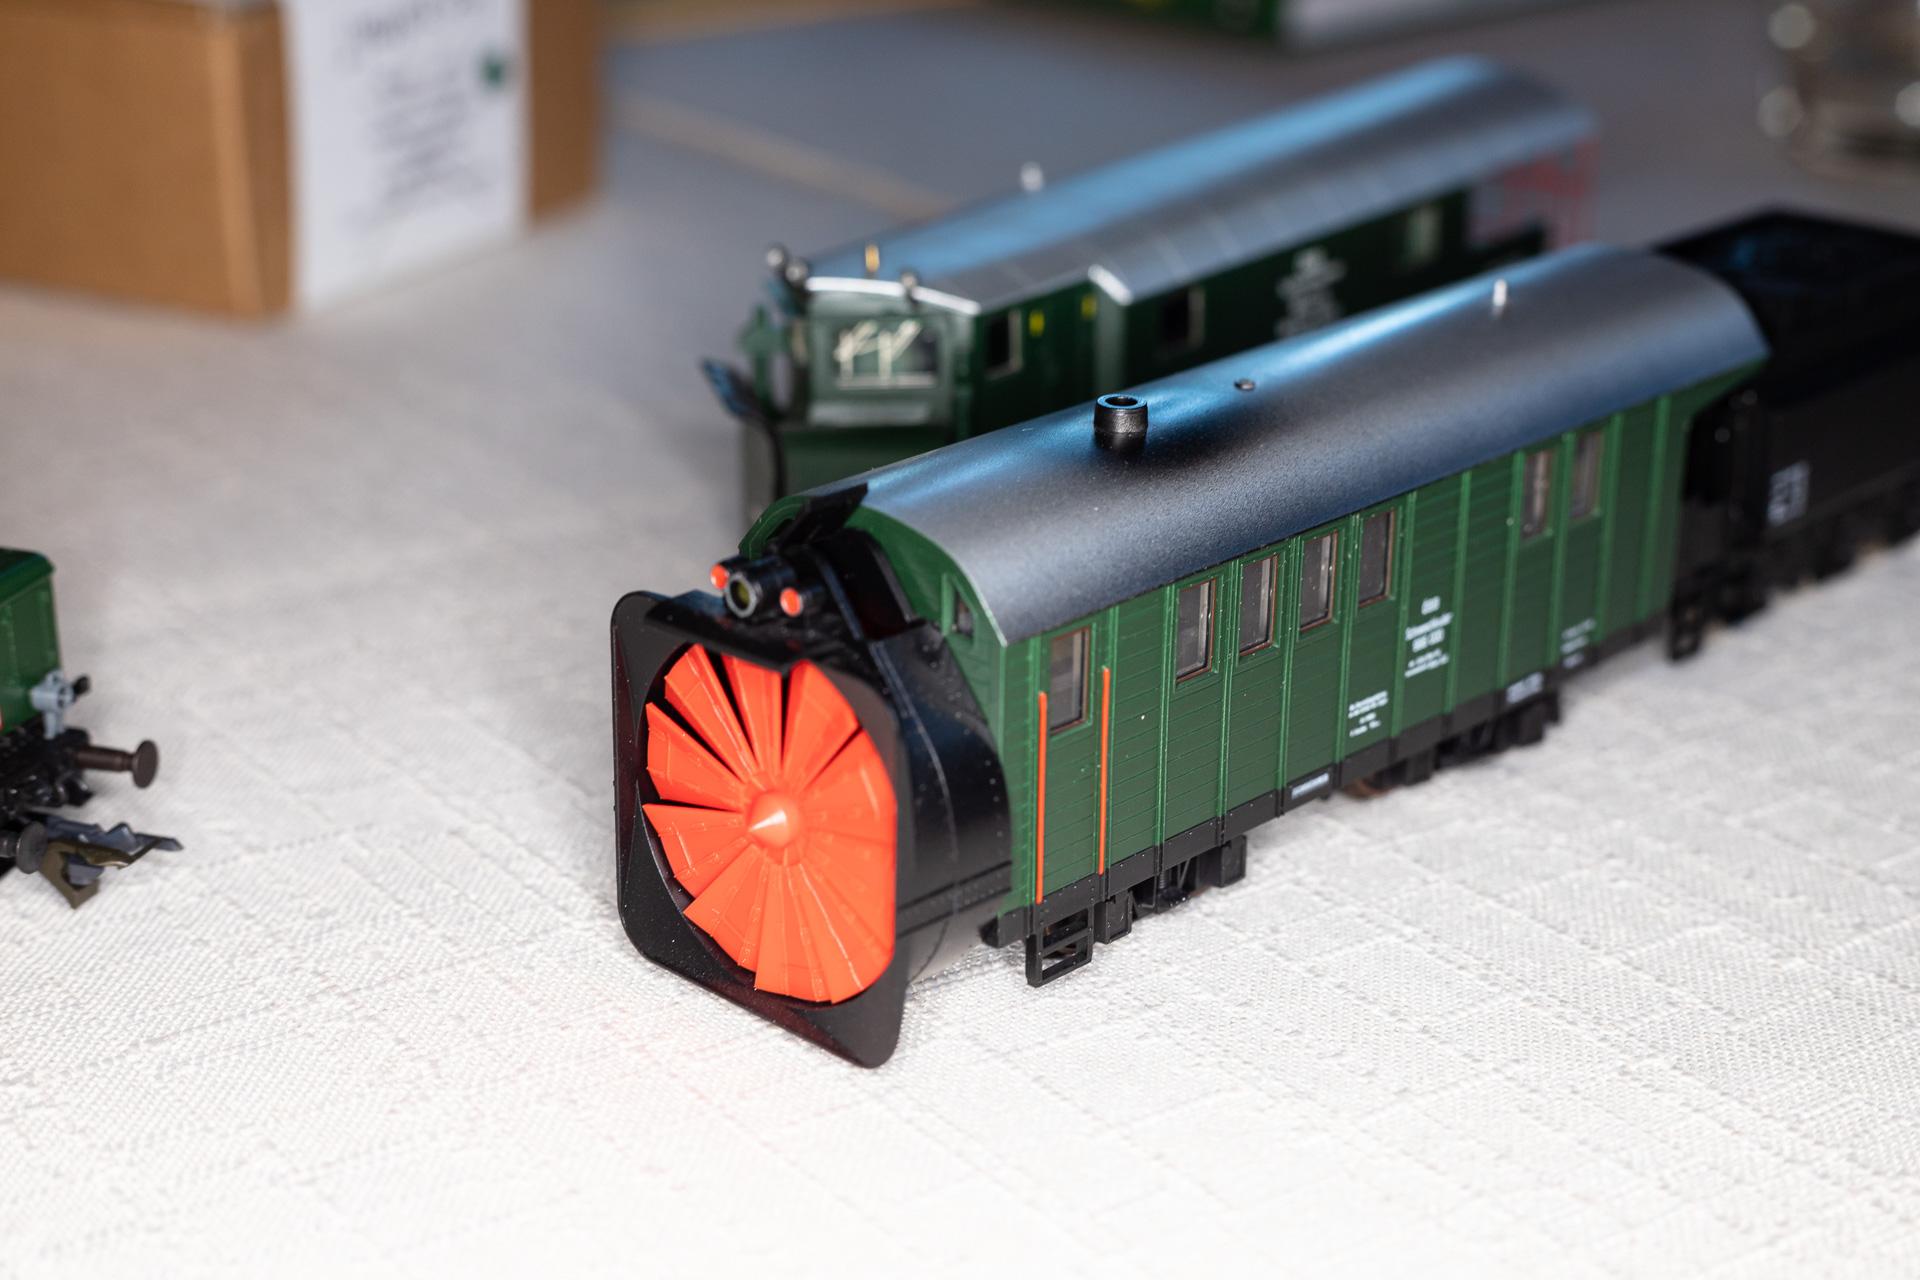 MG_6291